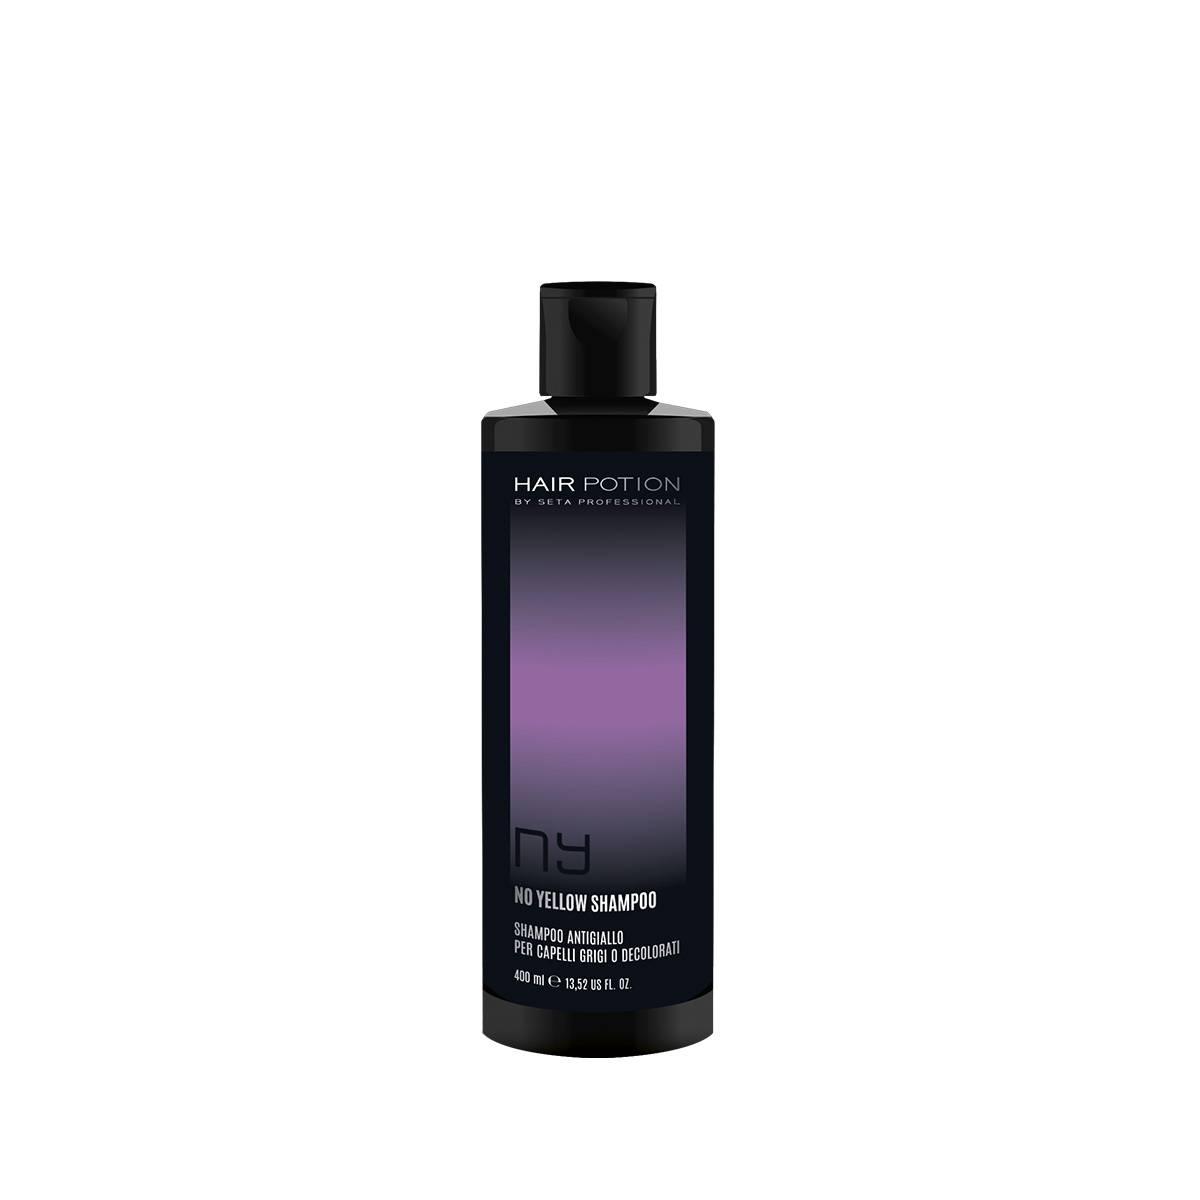 Hair Potion Pro No Yellow Shampoo 400ml